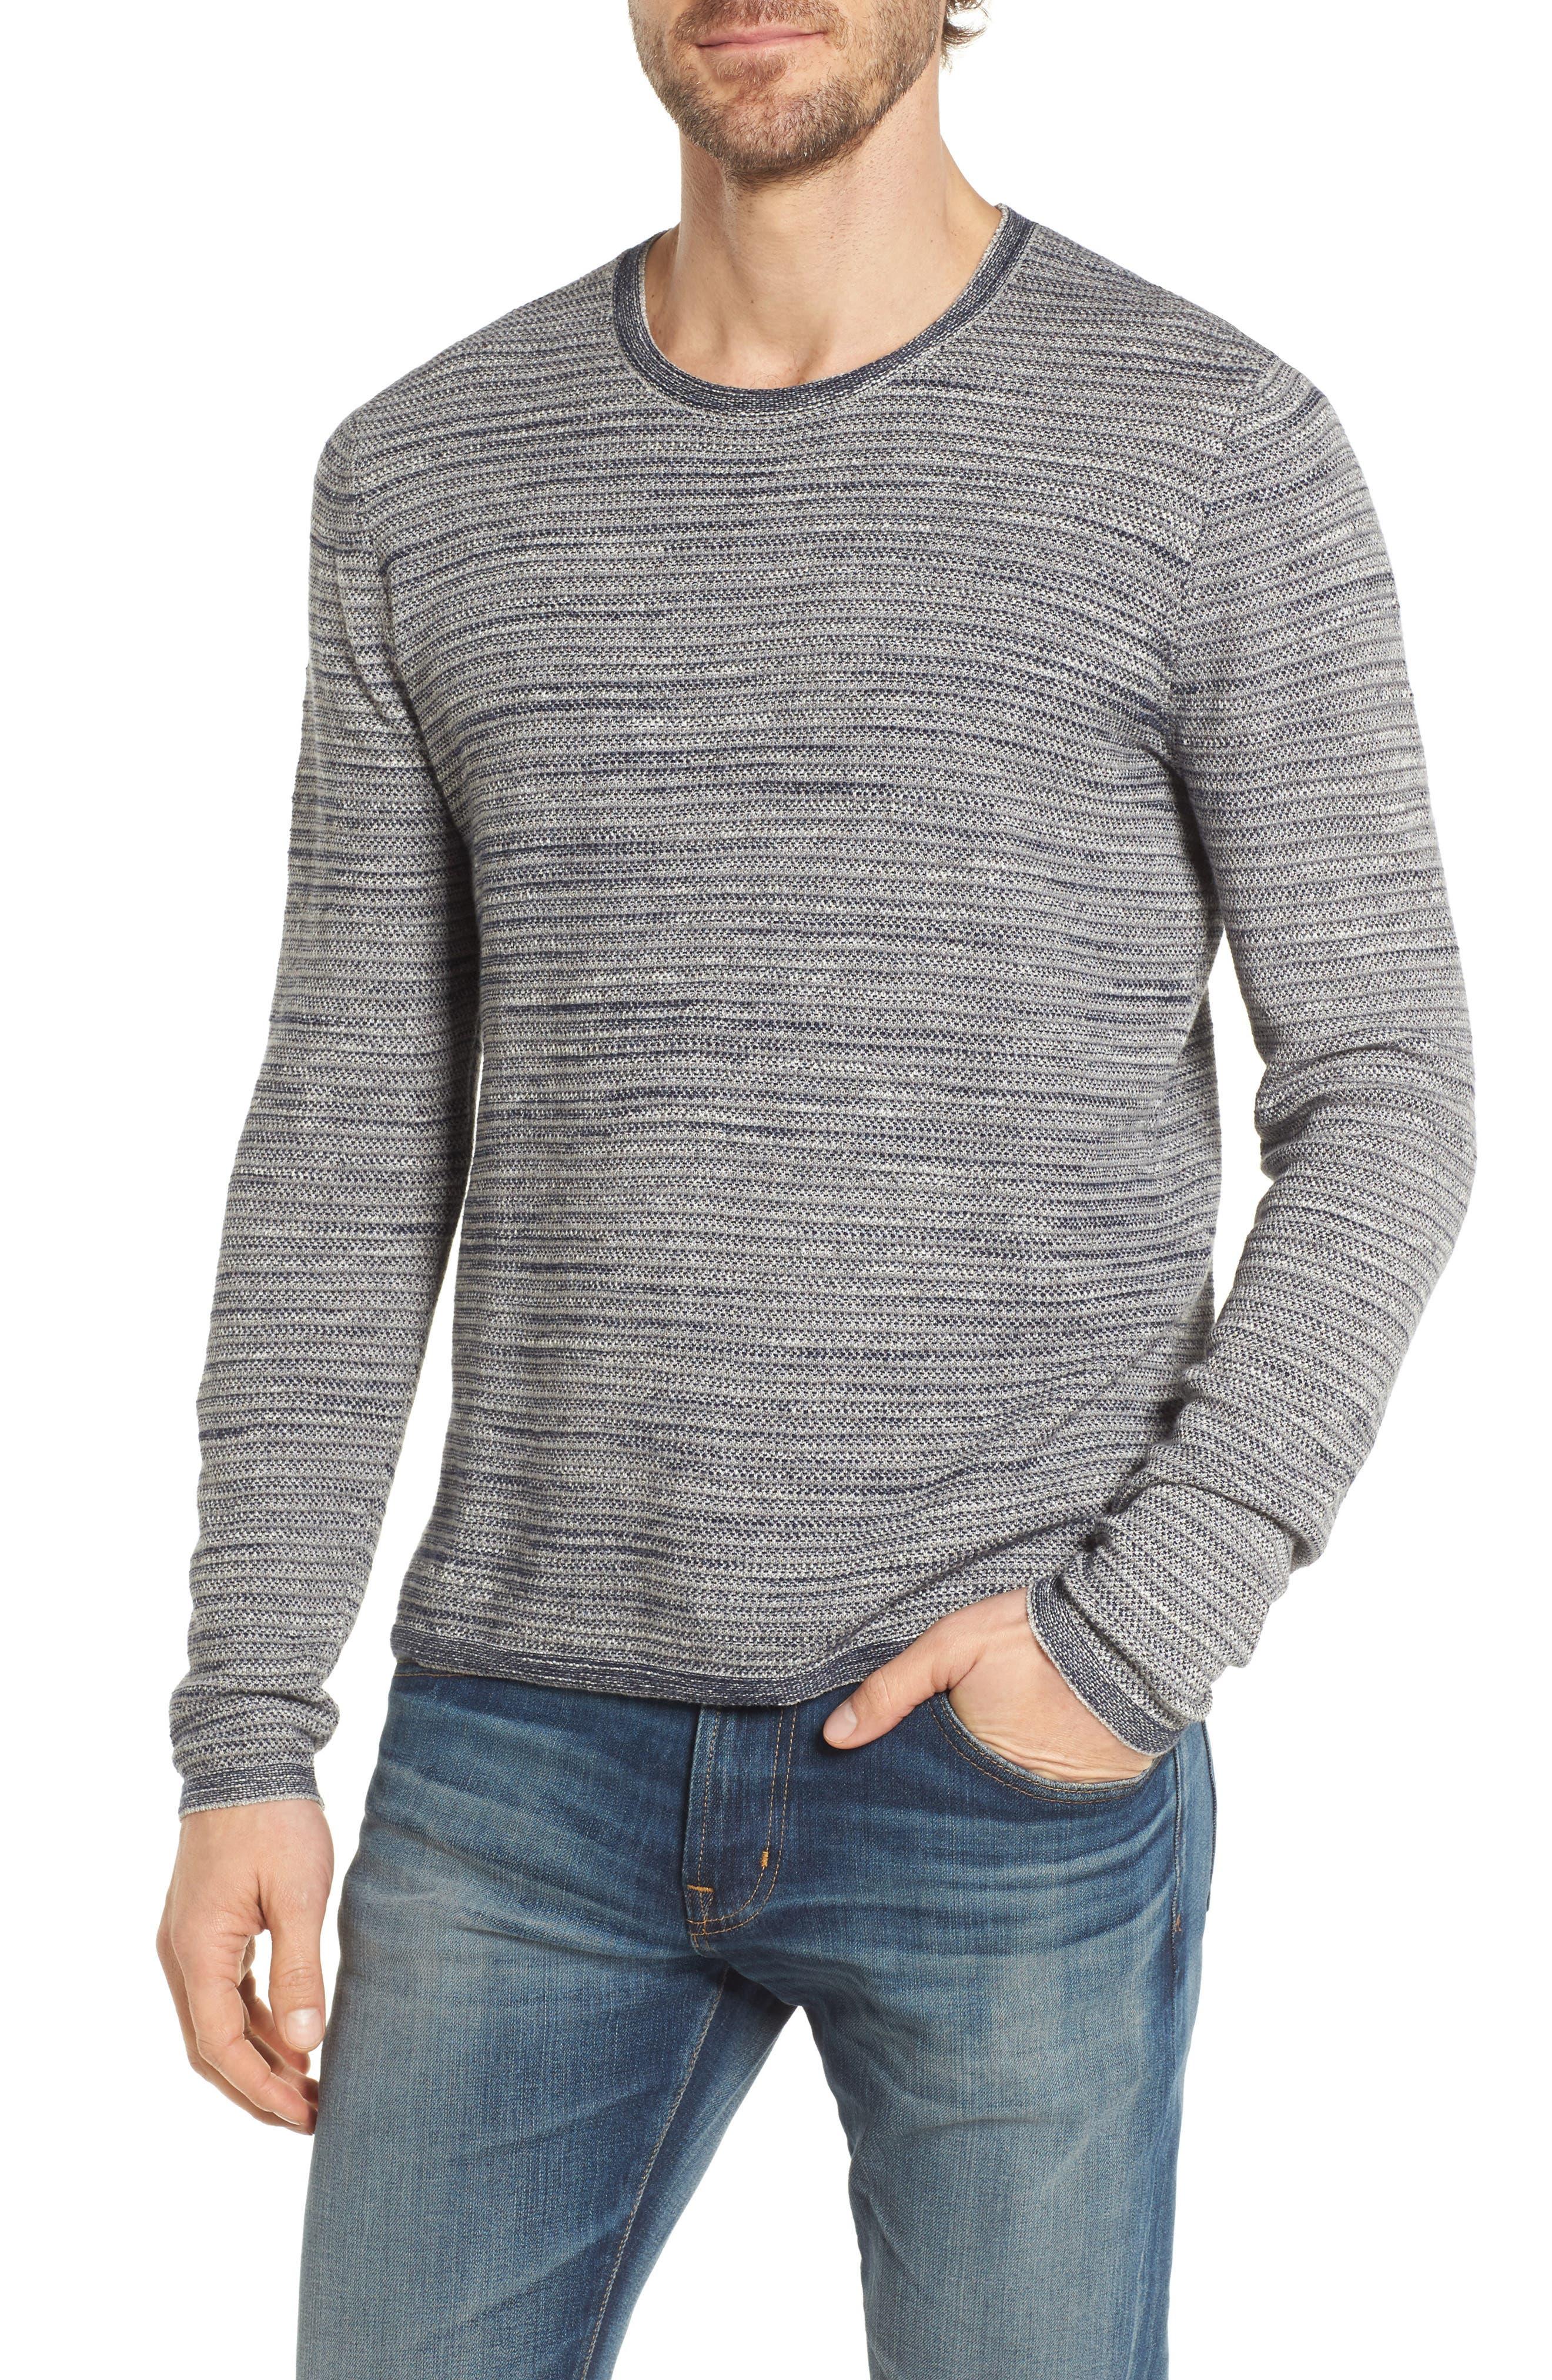 Main Image - Grayers Bird's Eye Cotton Jacquard Sweater